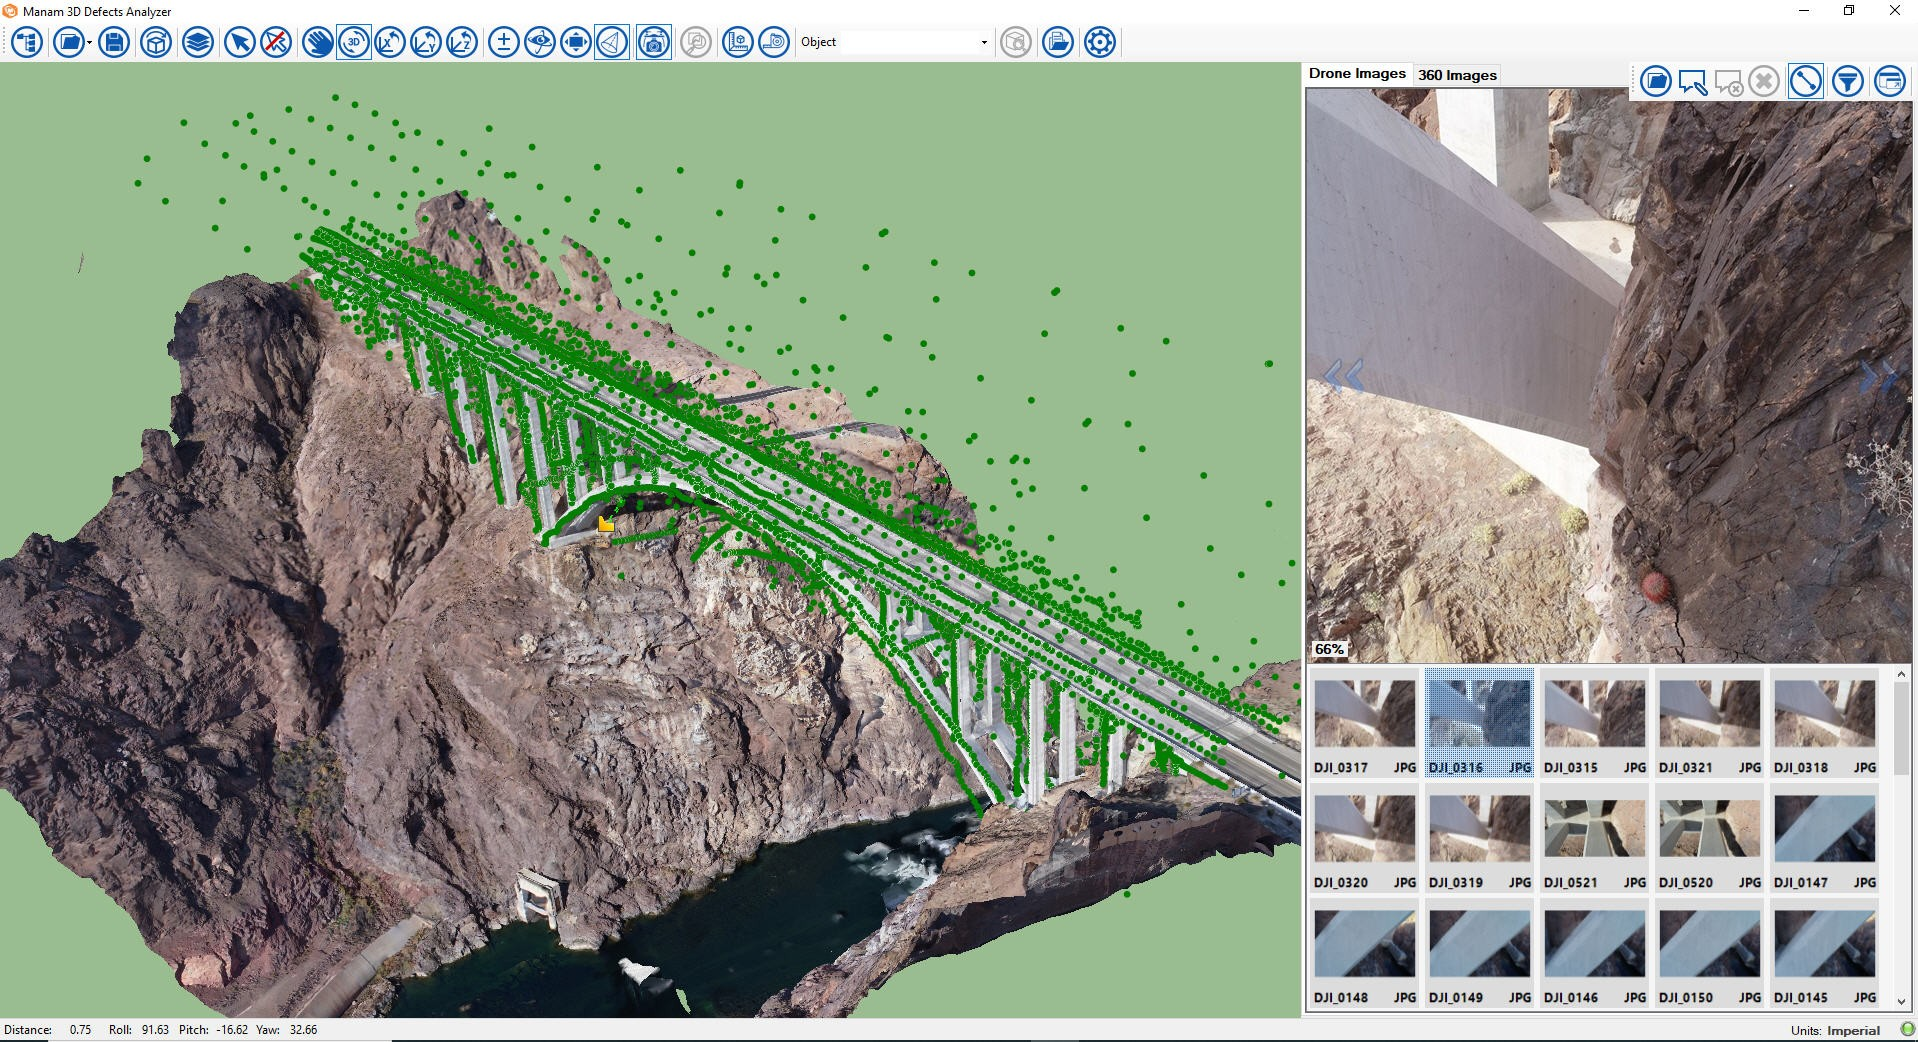 TILLMAN BRIDGE, NV | JAN/2021